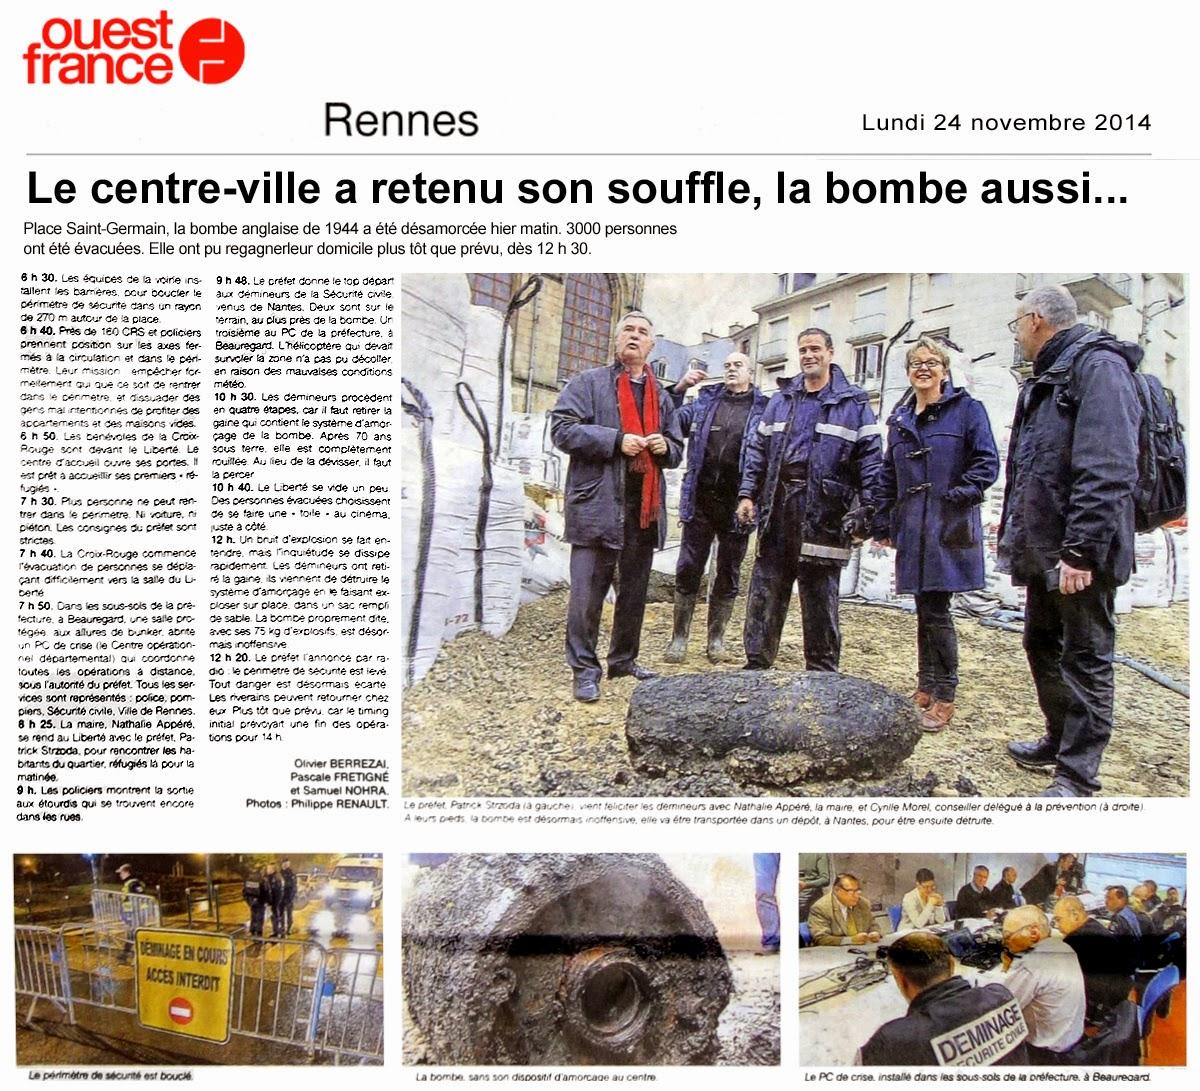 """Le centre-ville a retenu son souffle, la bombe aussi..."" - Ouest-France - Lundi 24 novembre 2014"